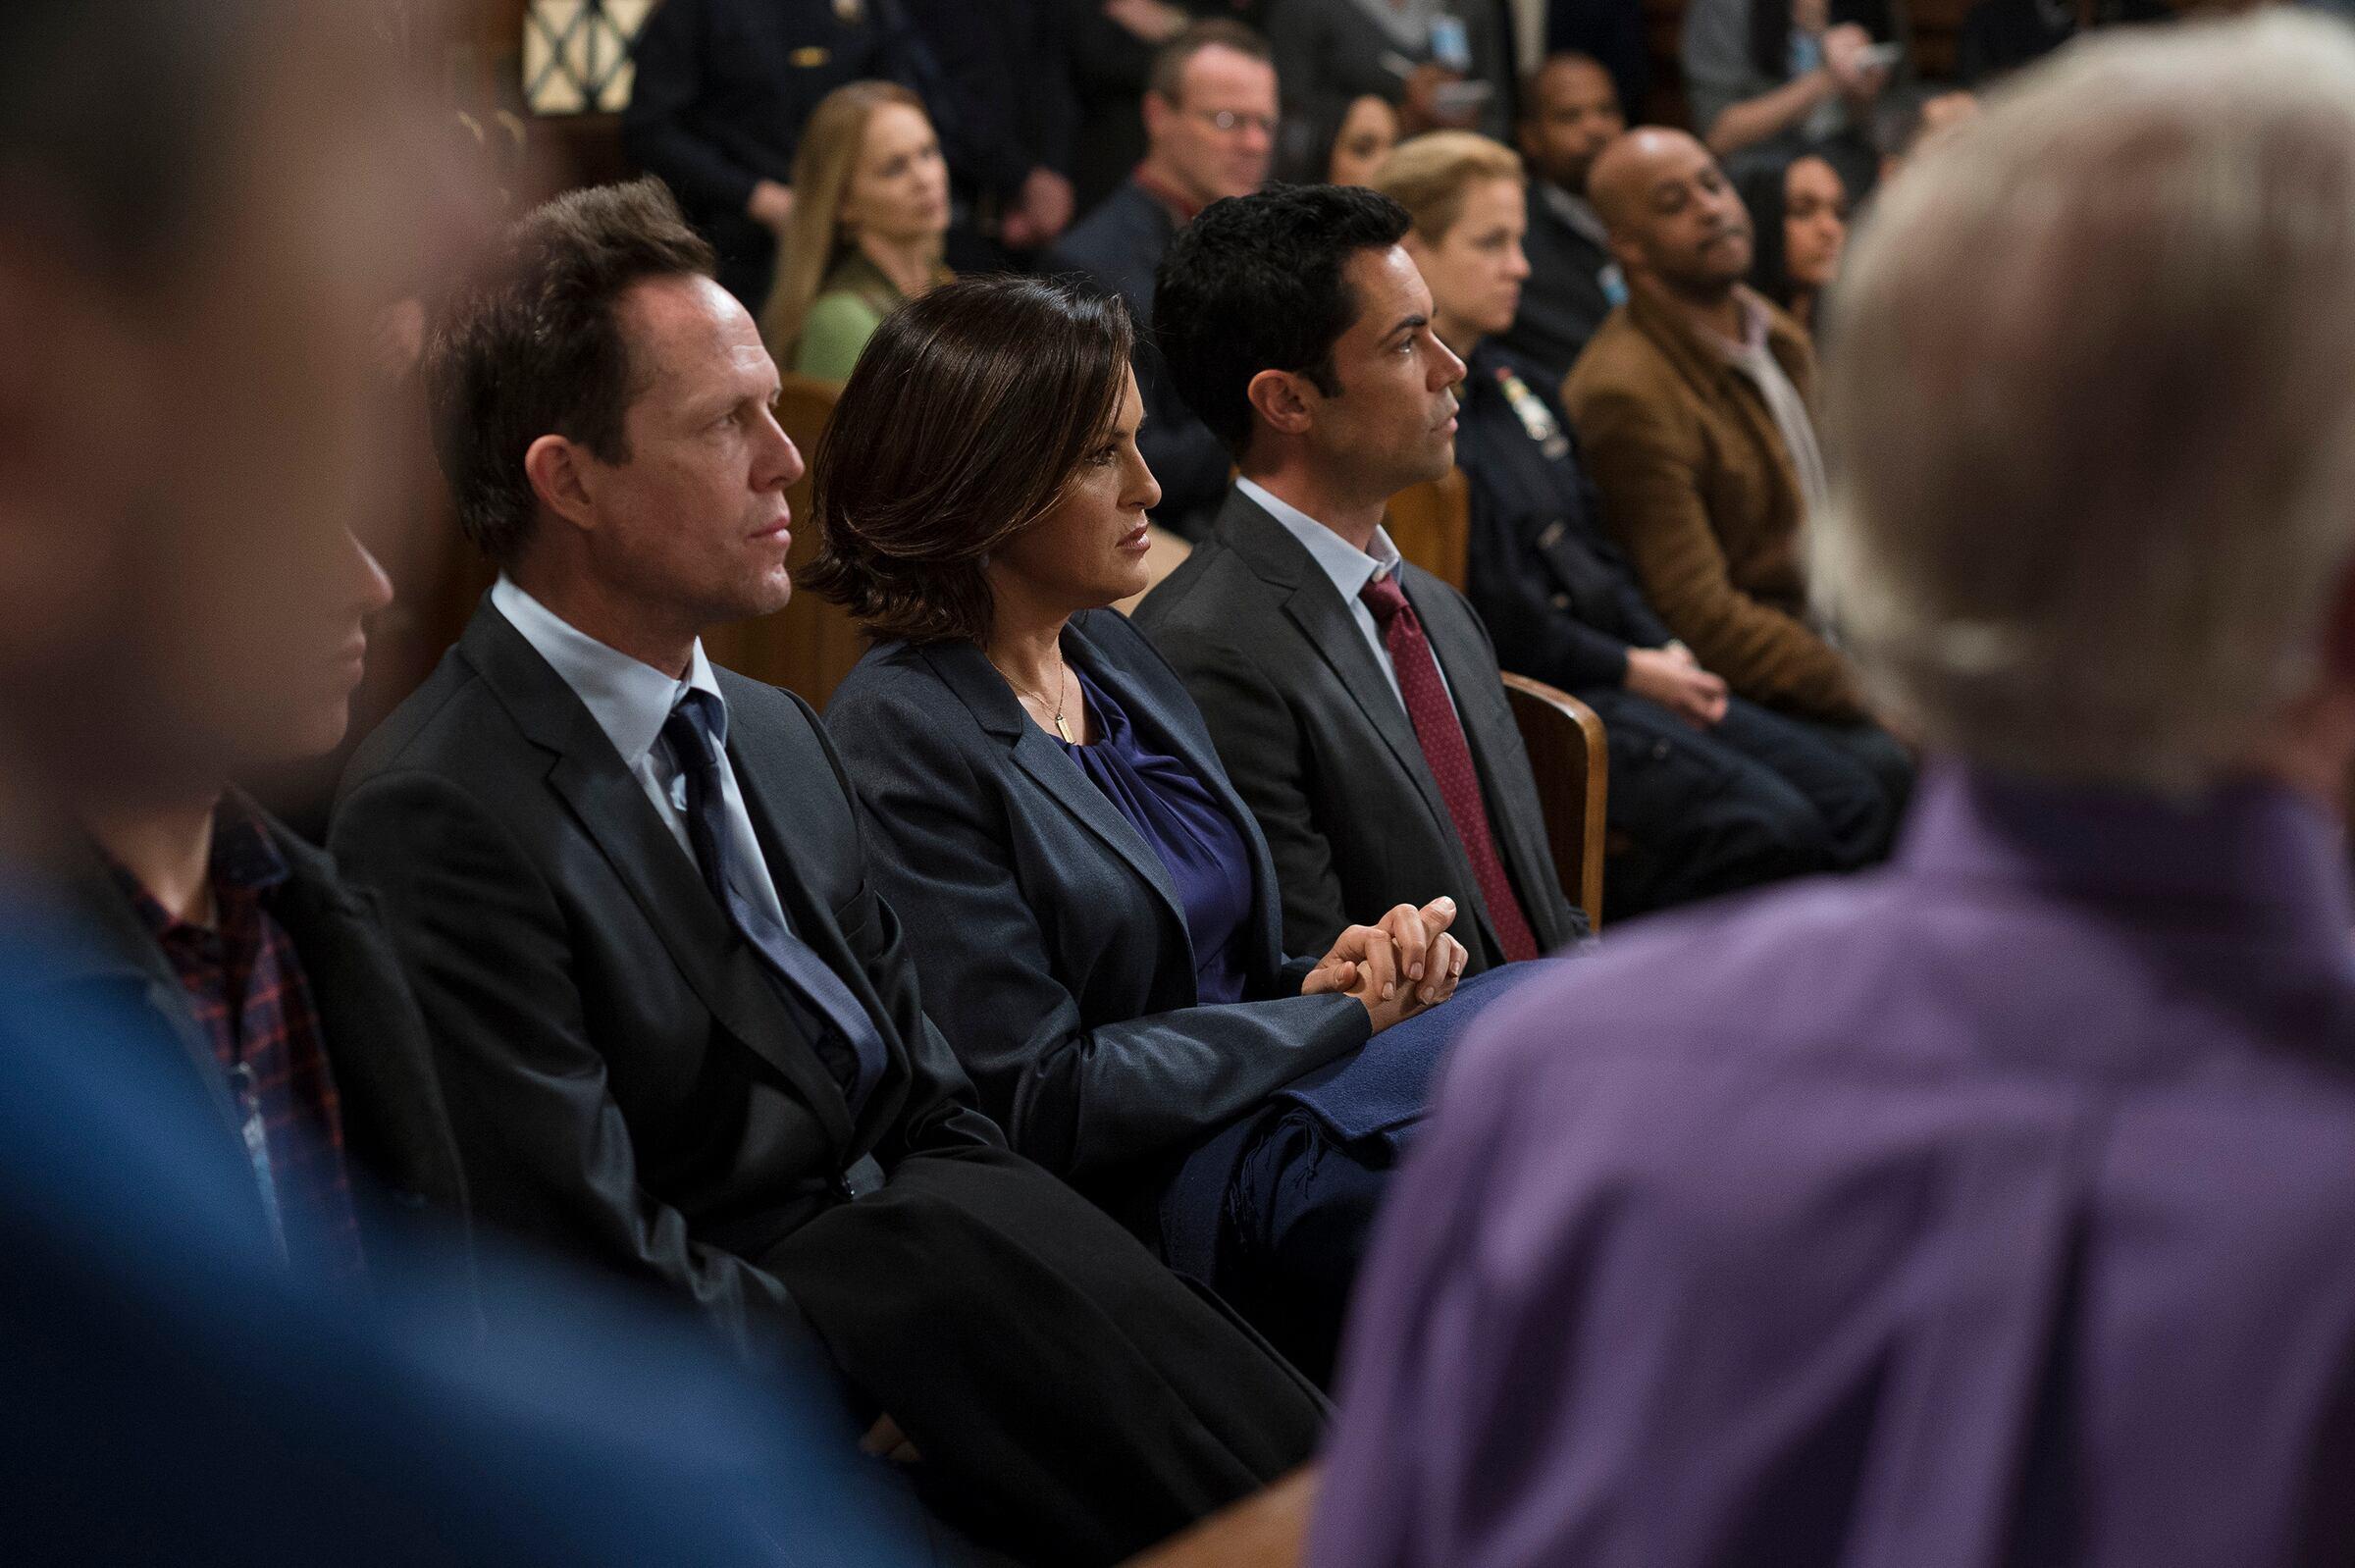 Law & Order SVU - Episode 1509 - Psycho Therapist